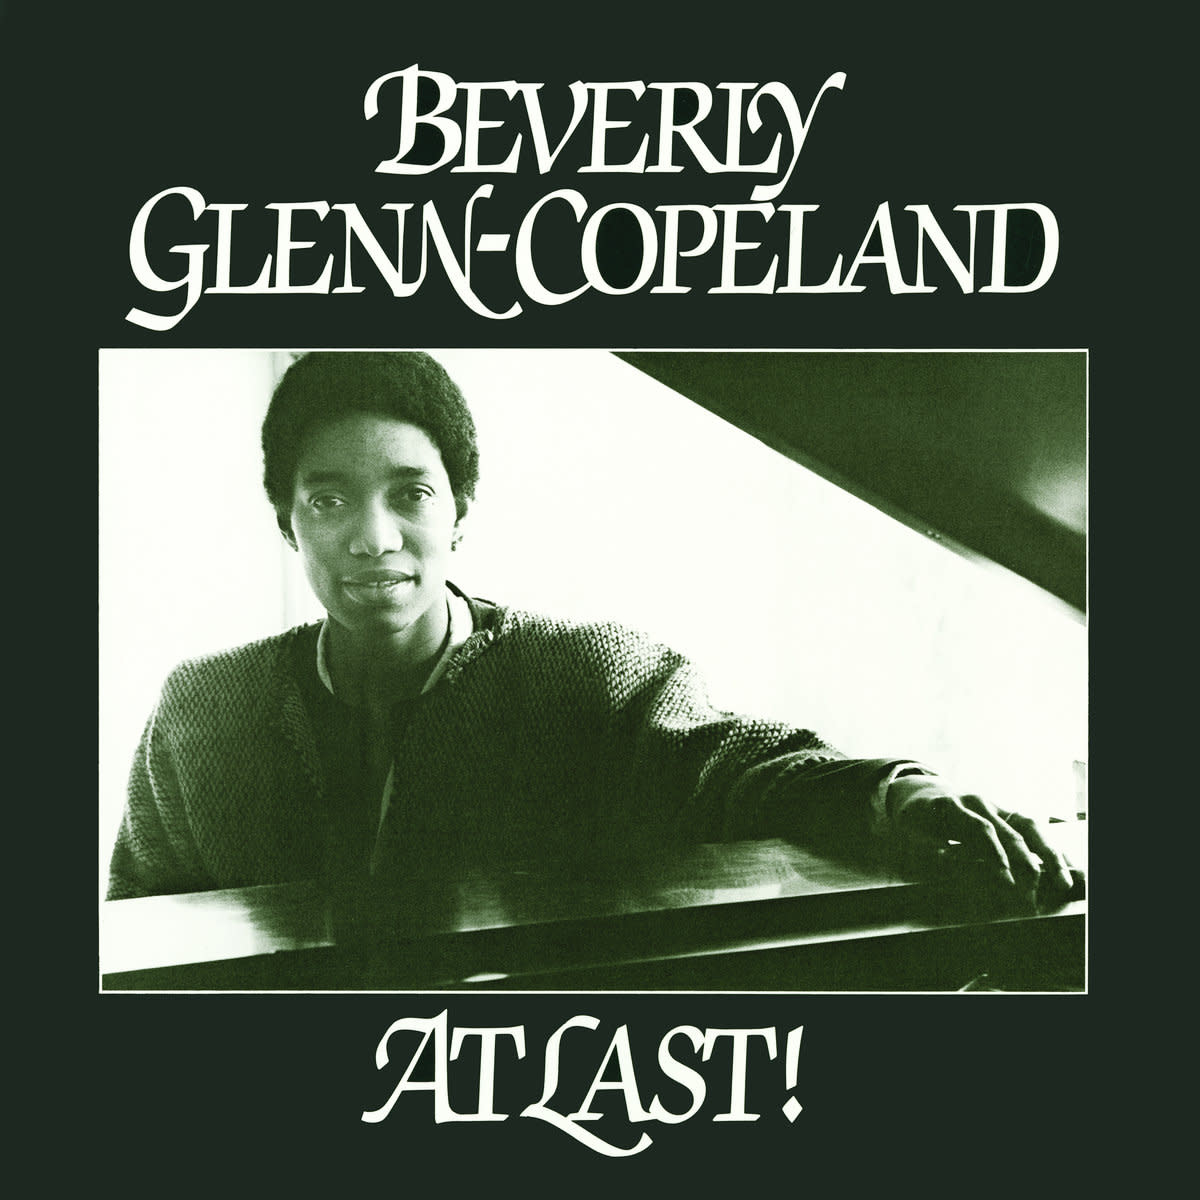 Beverly Glenn-Copeland • At Last! EP-1